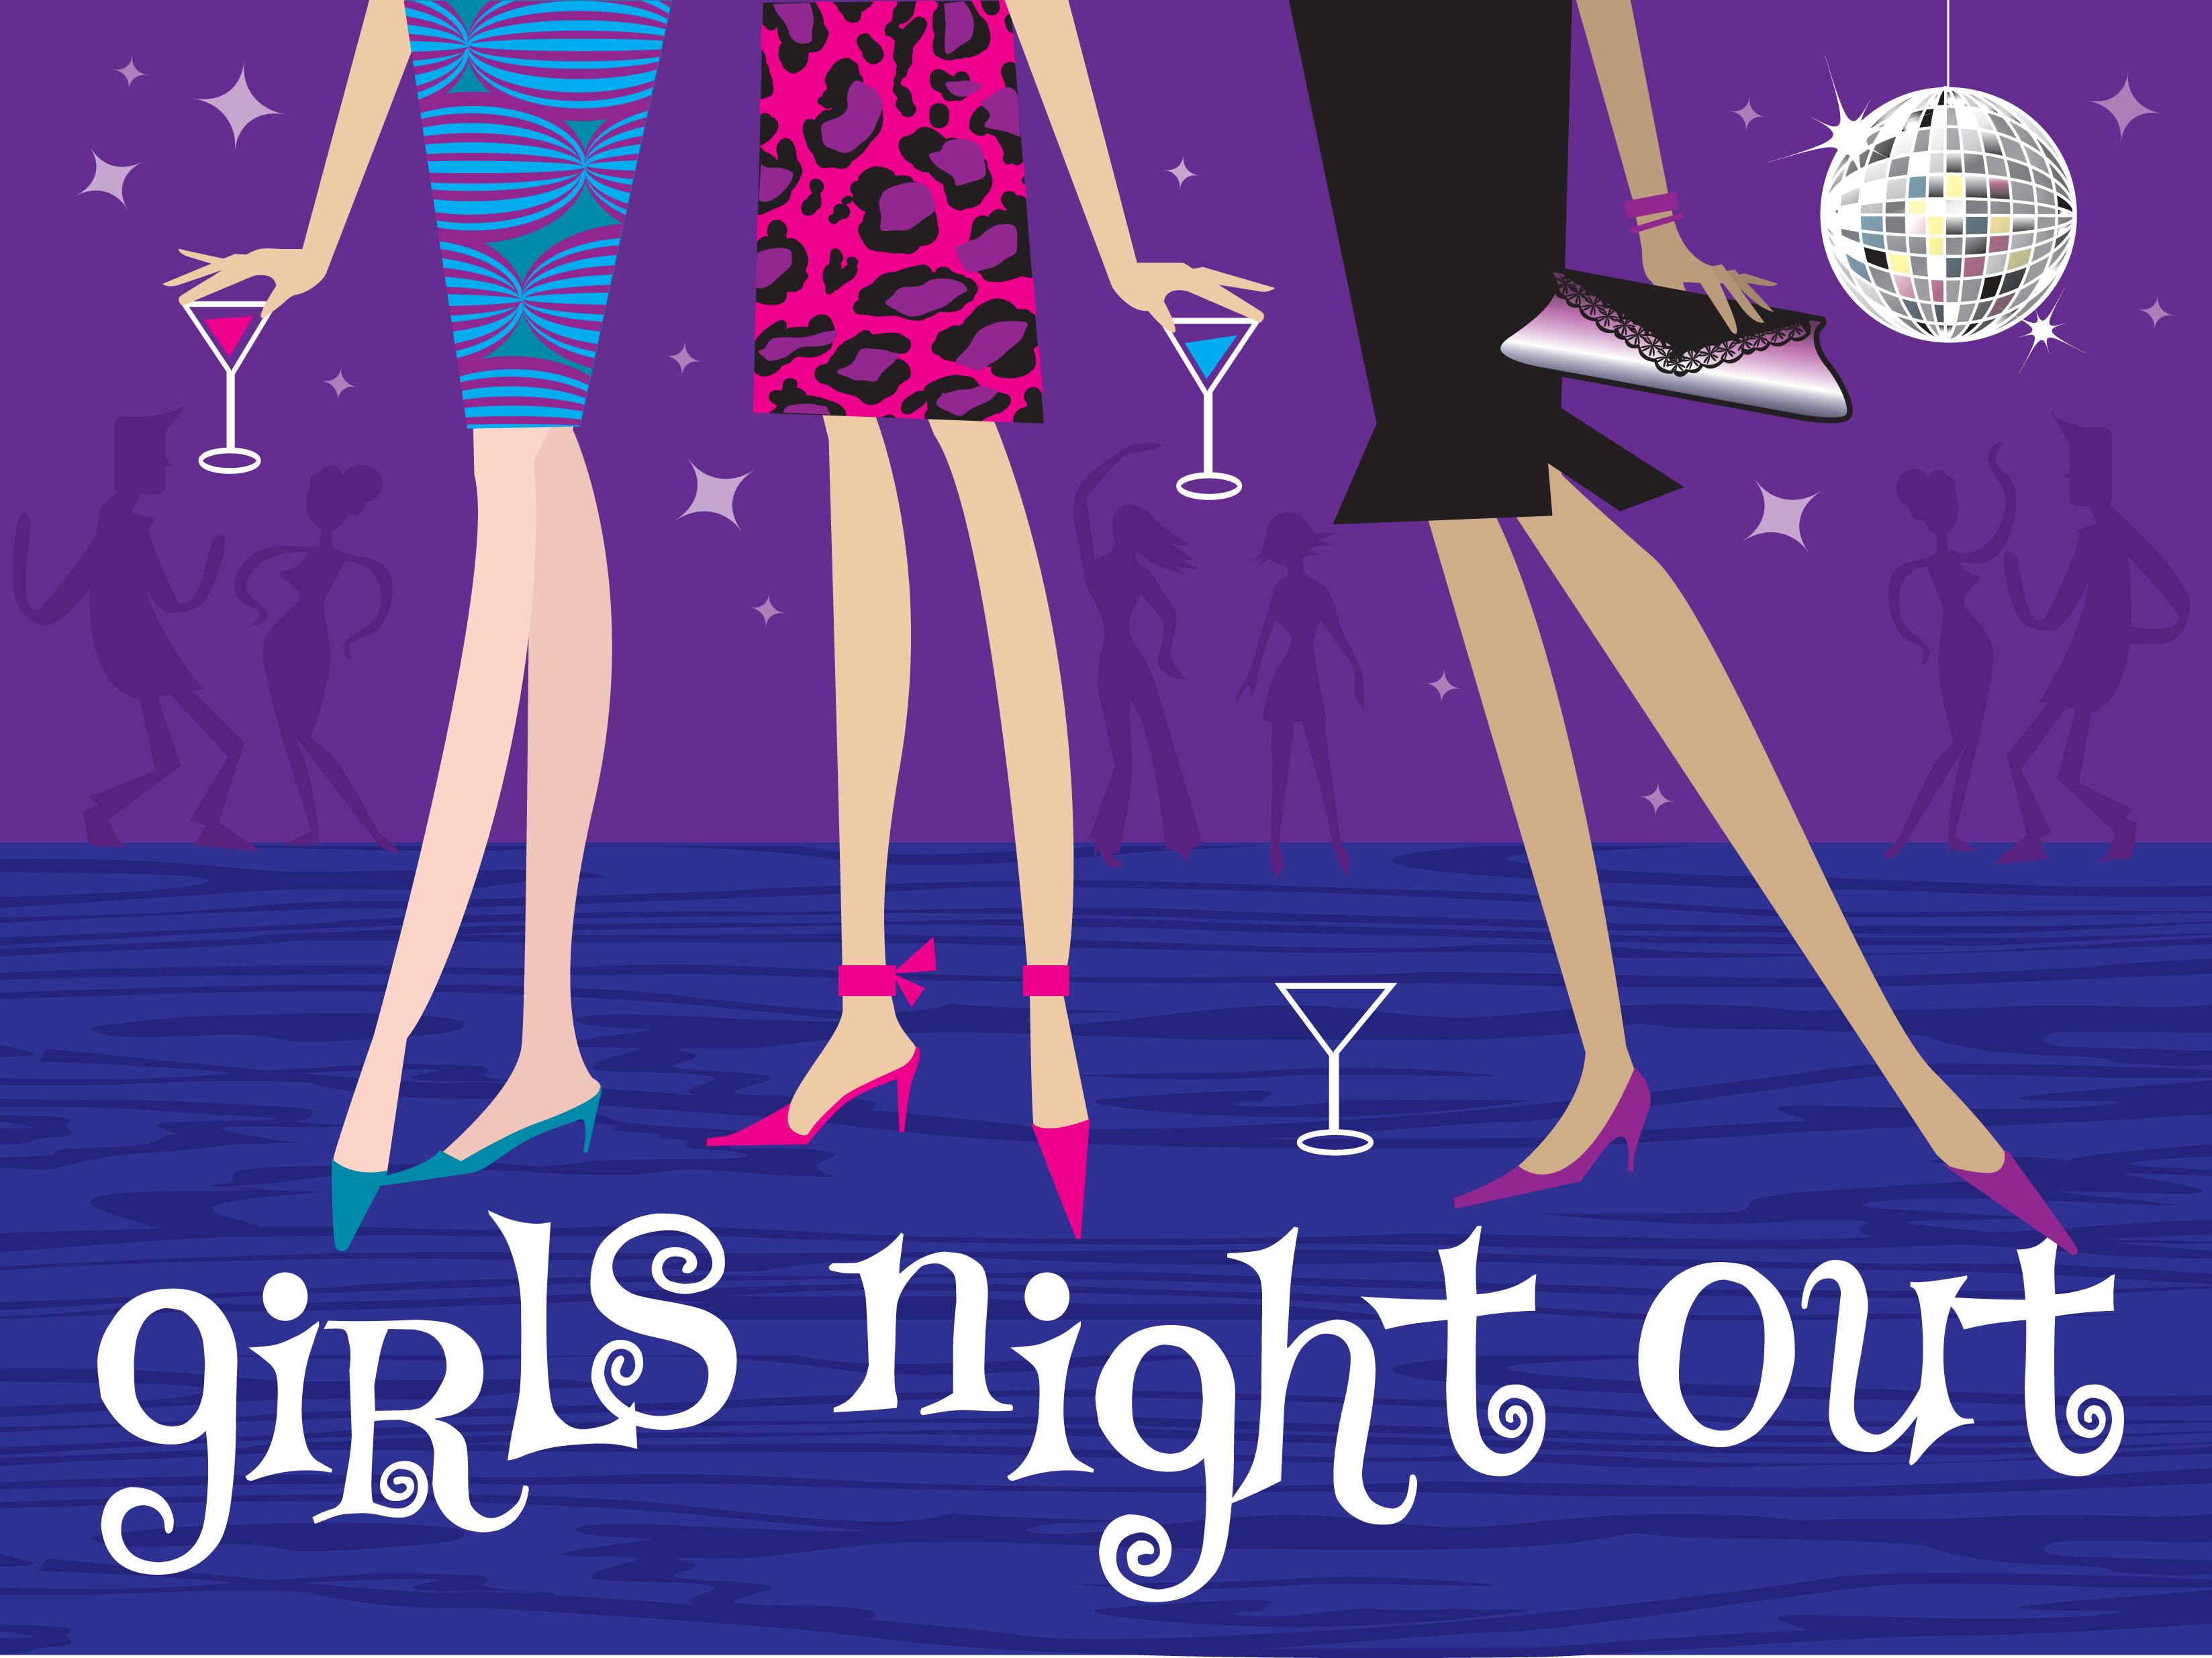 Girls Night Arrives At Bay .-Girls Night Arrives At Bay .-1